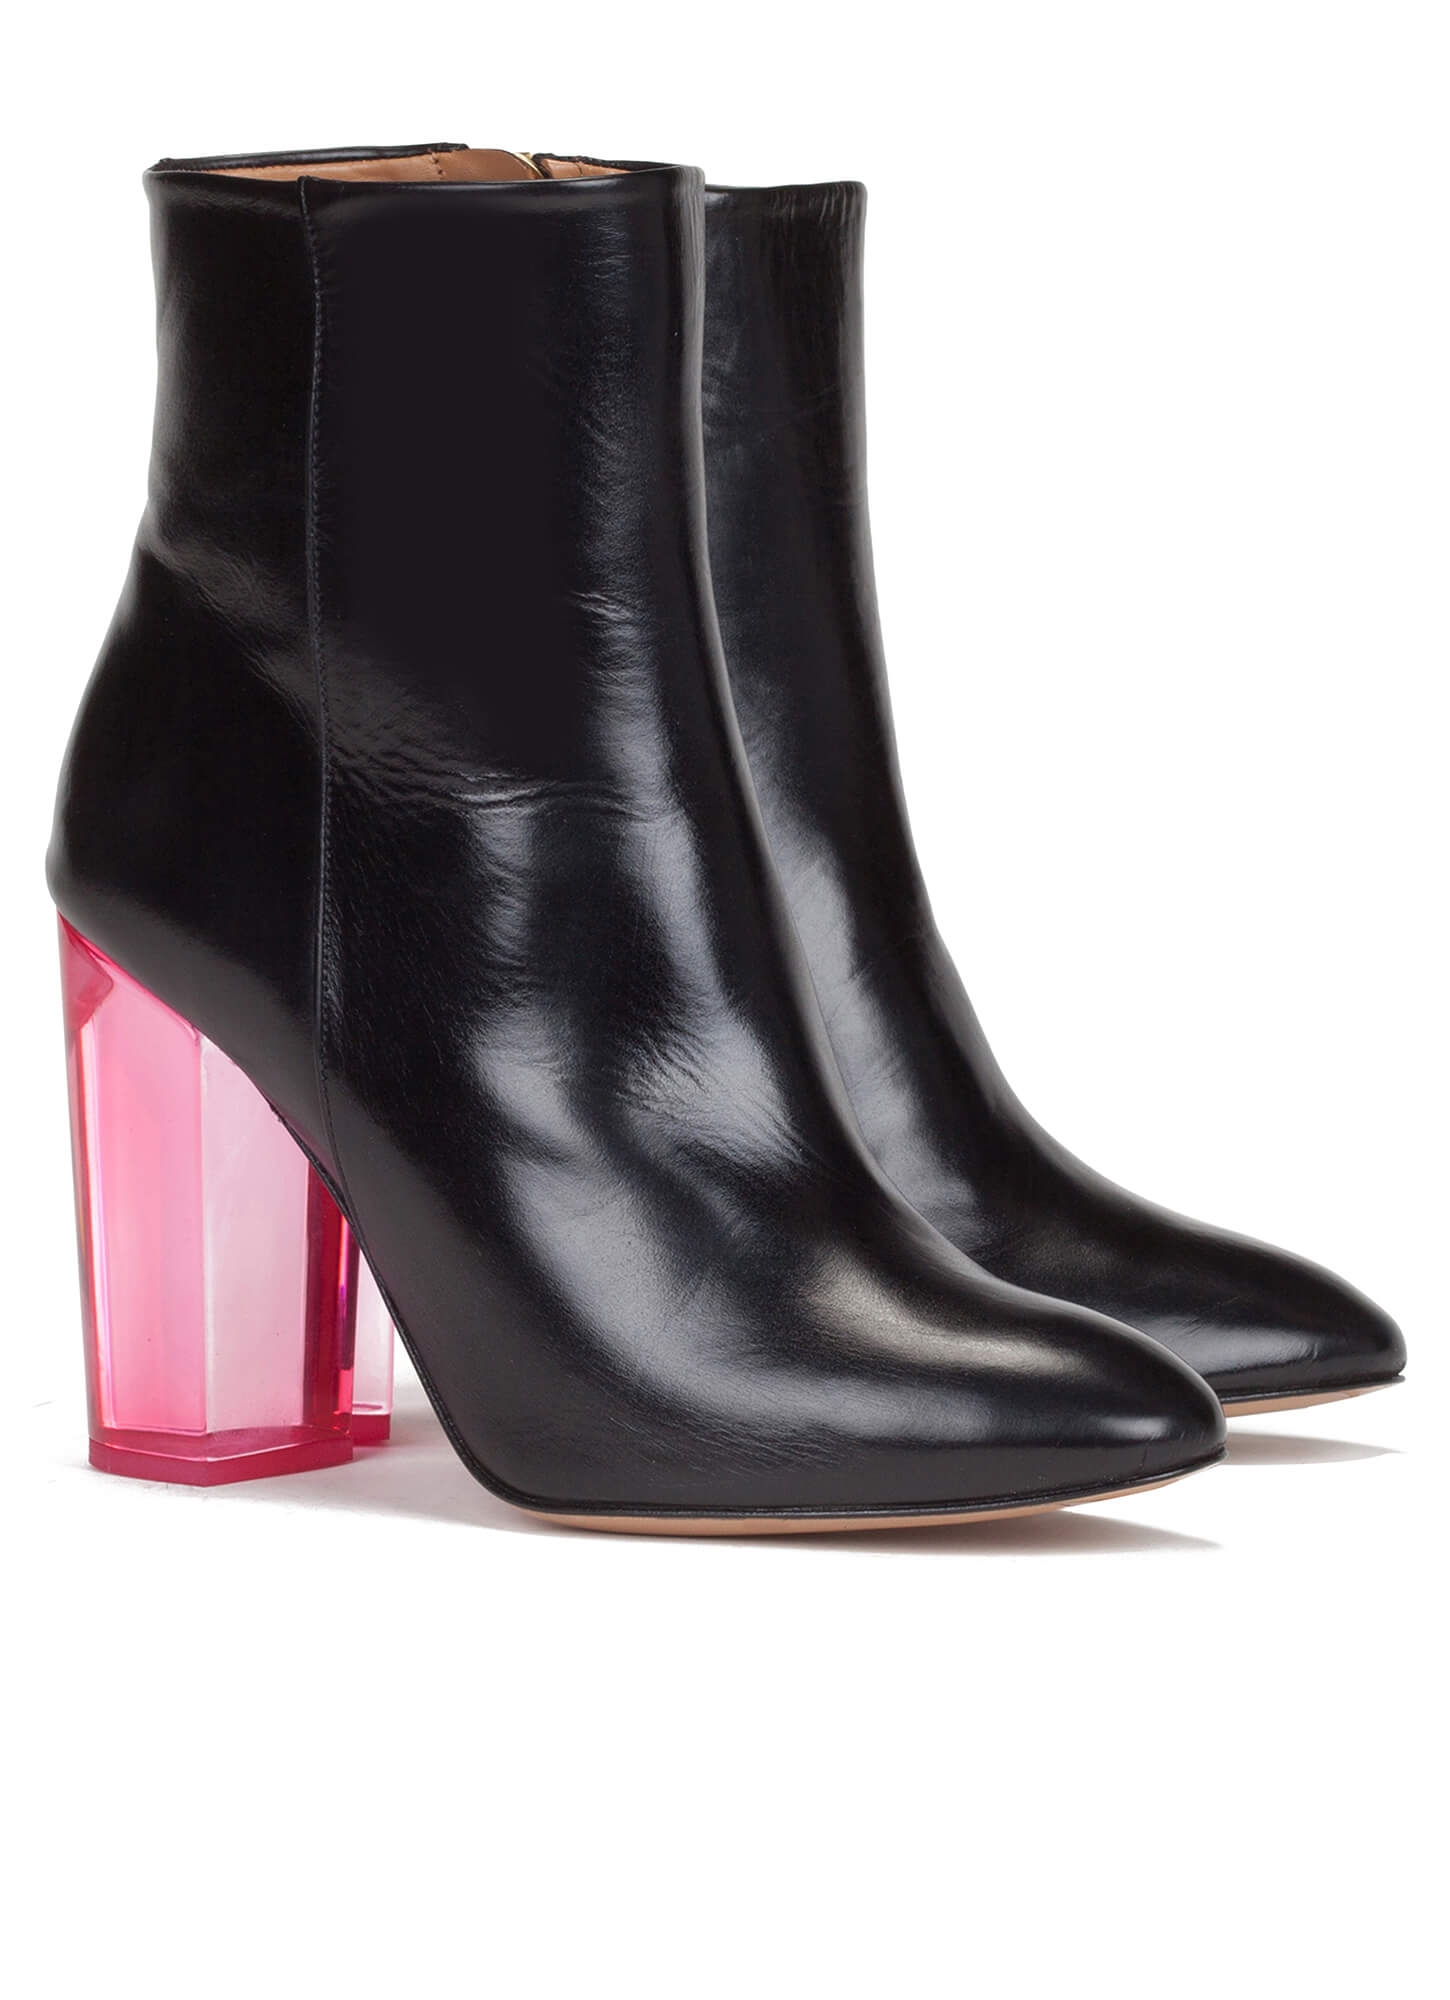 b9adbf6ea9431 Clear high block heel ankle boots - online shoe store Pura Lopez ...